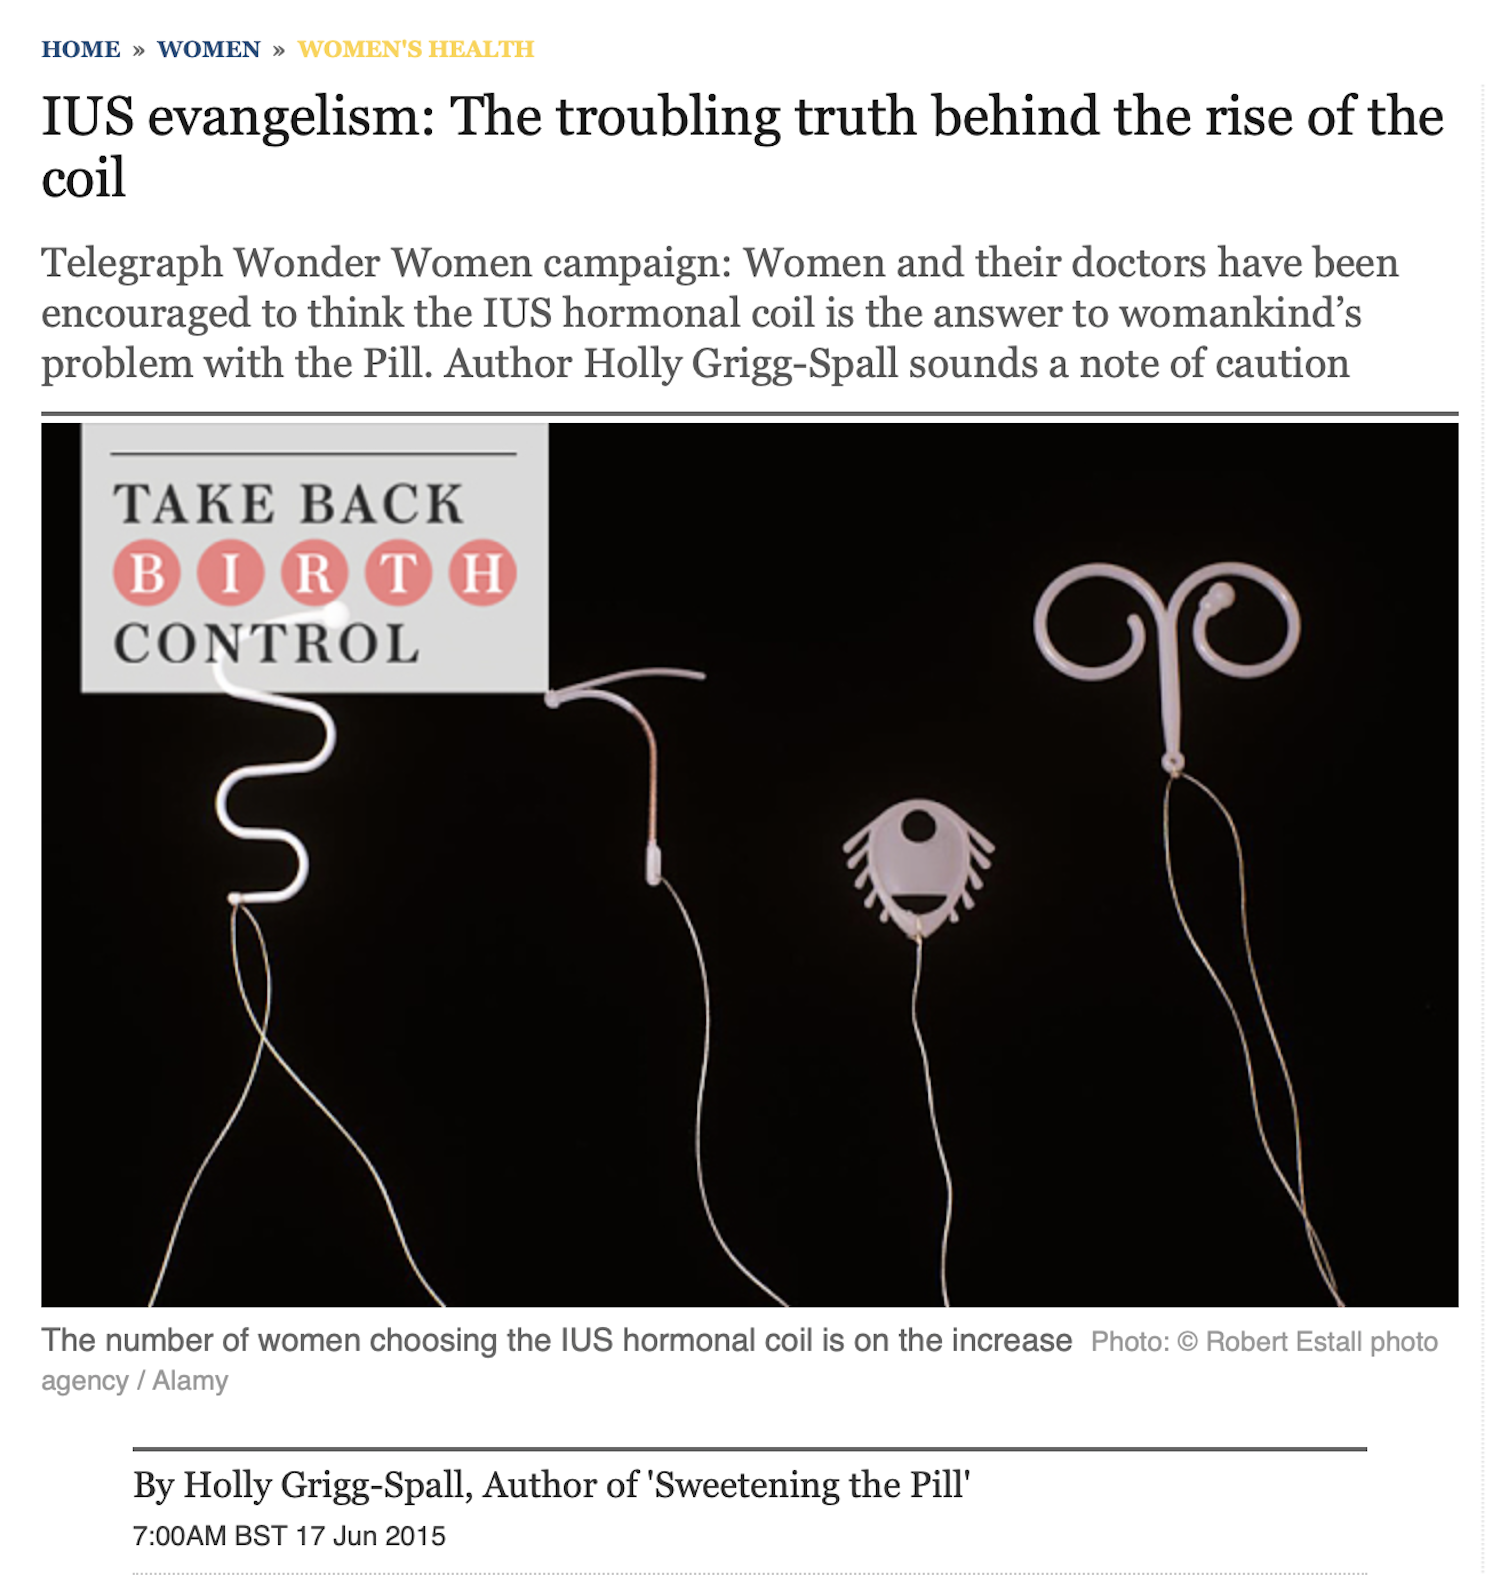 June 2015 - The Telegraph